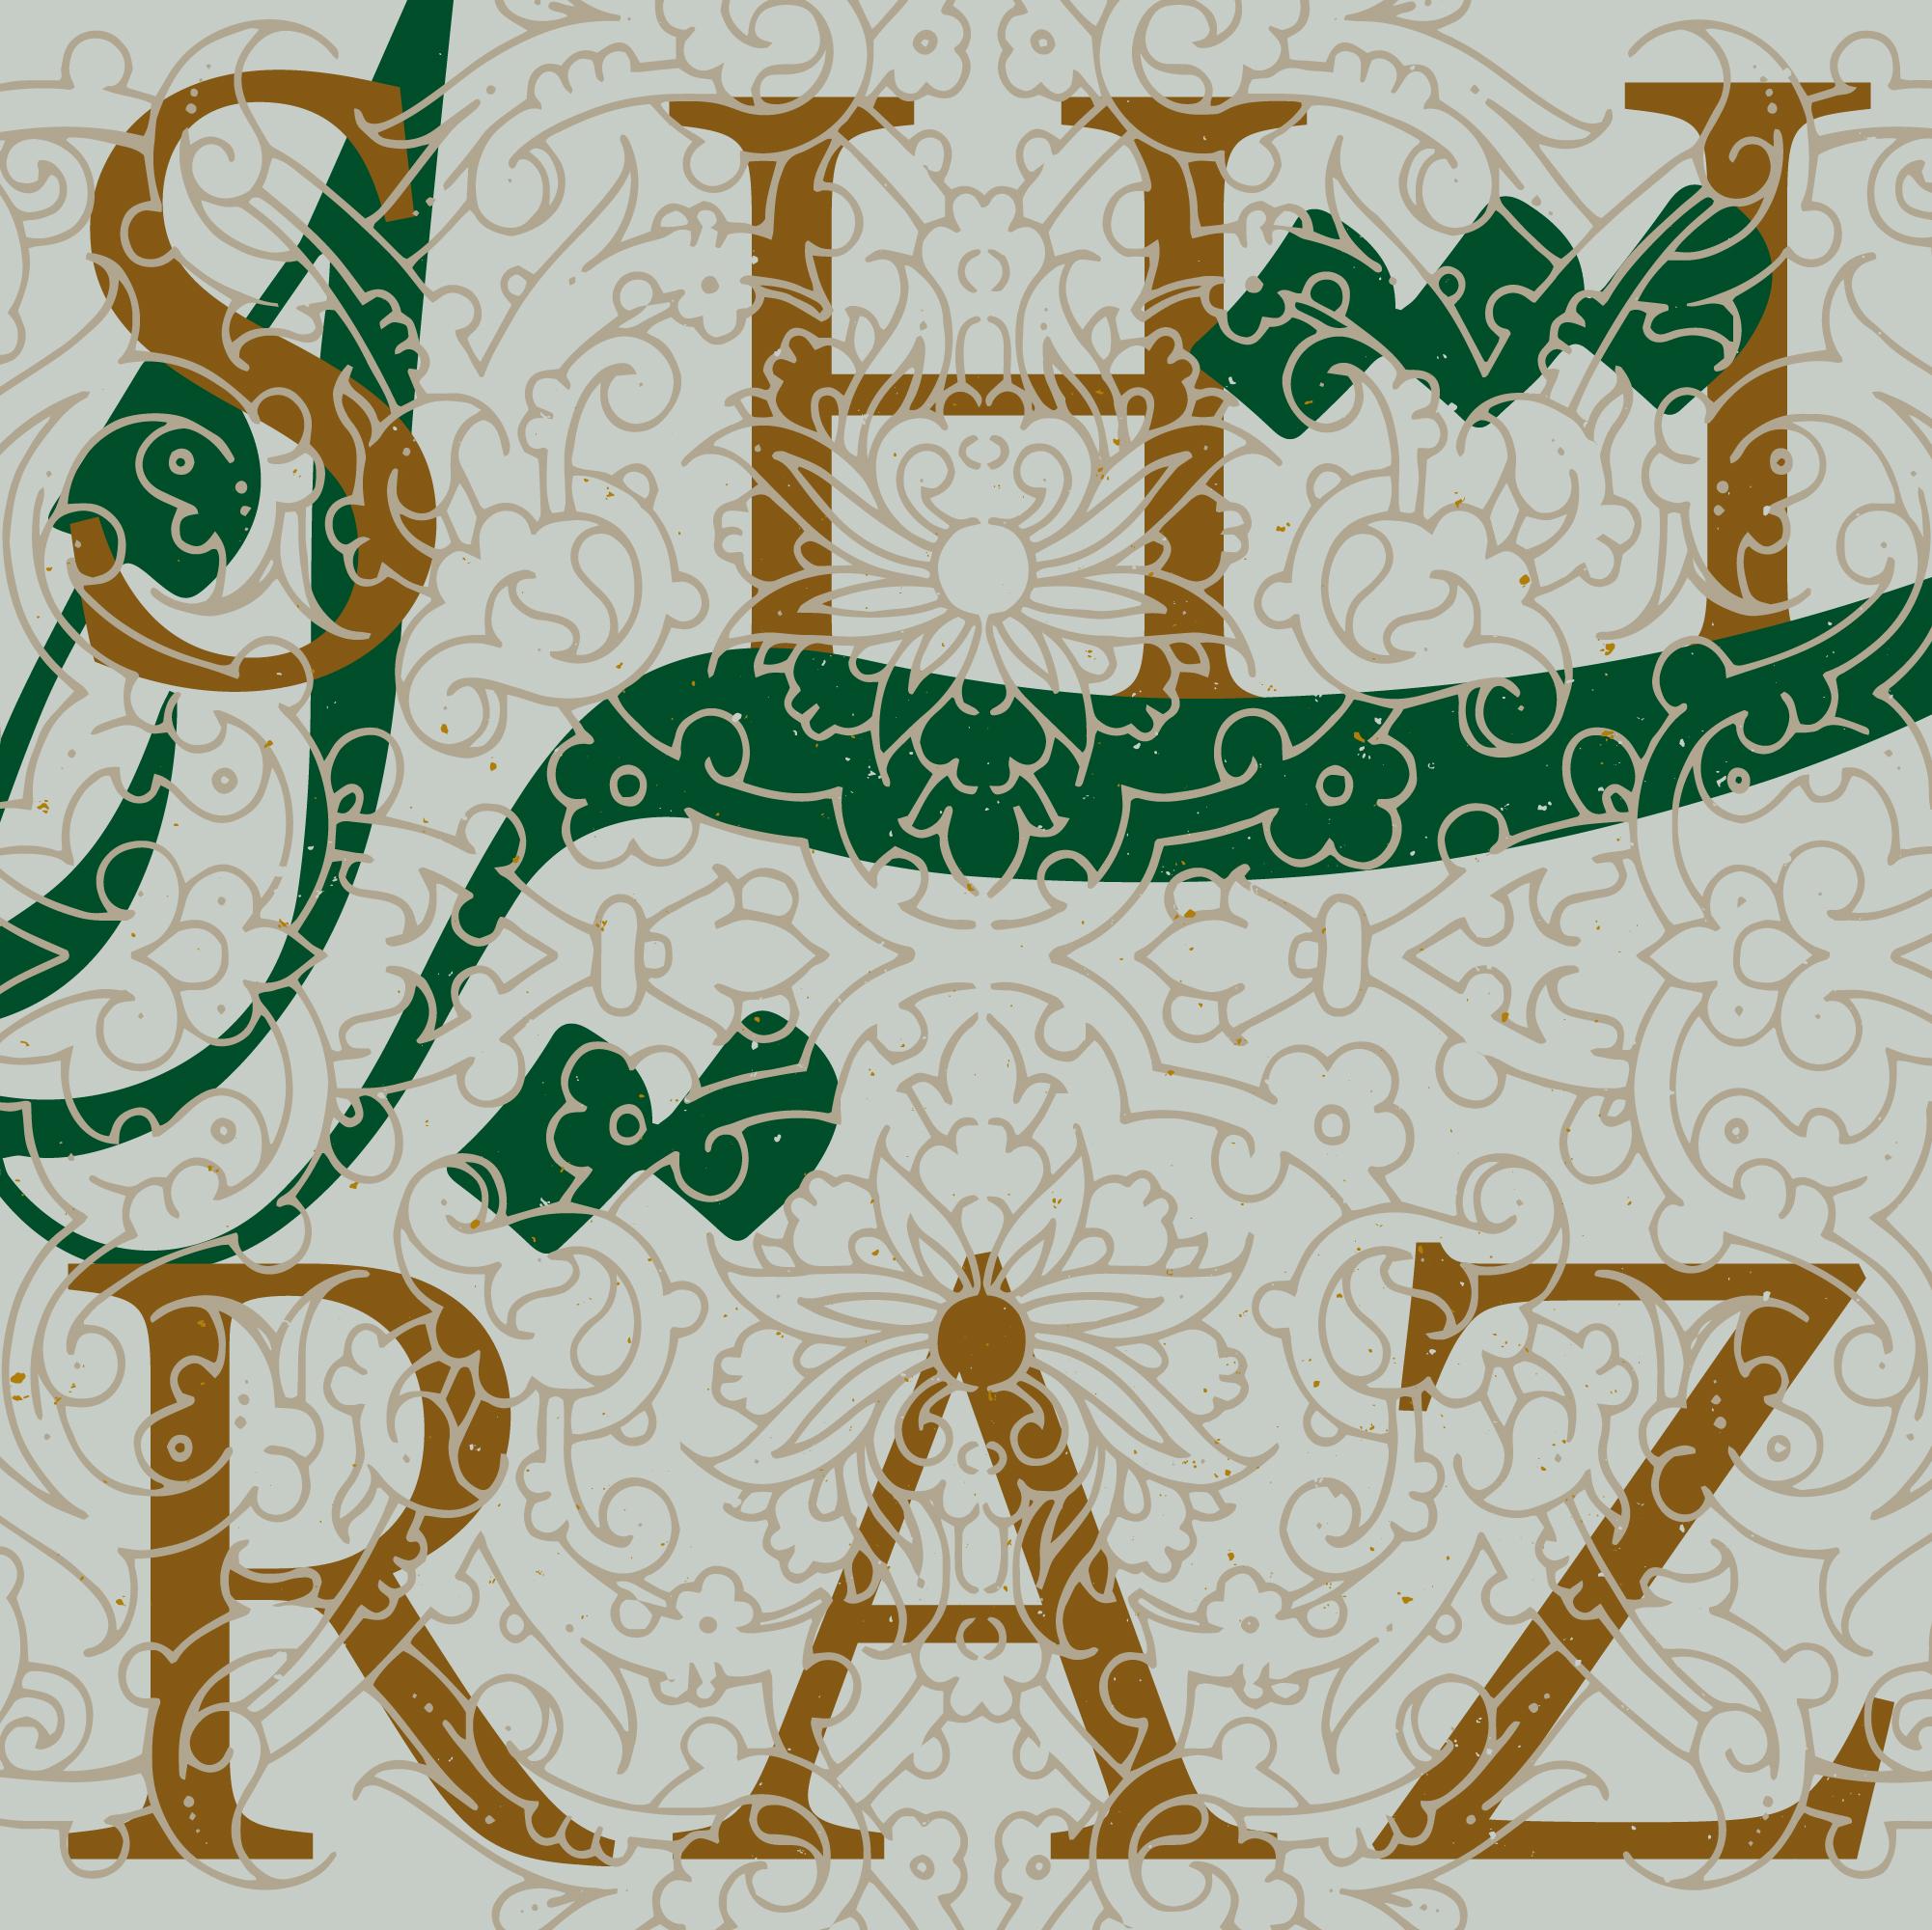 Shiraz (Instrumental)